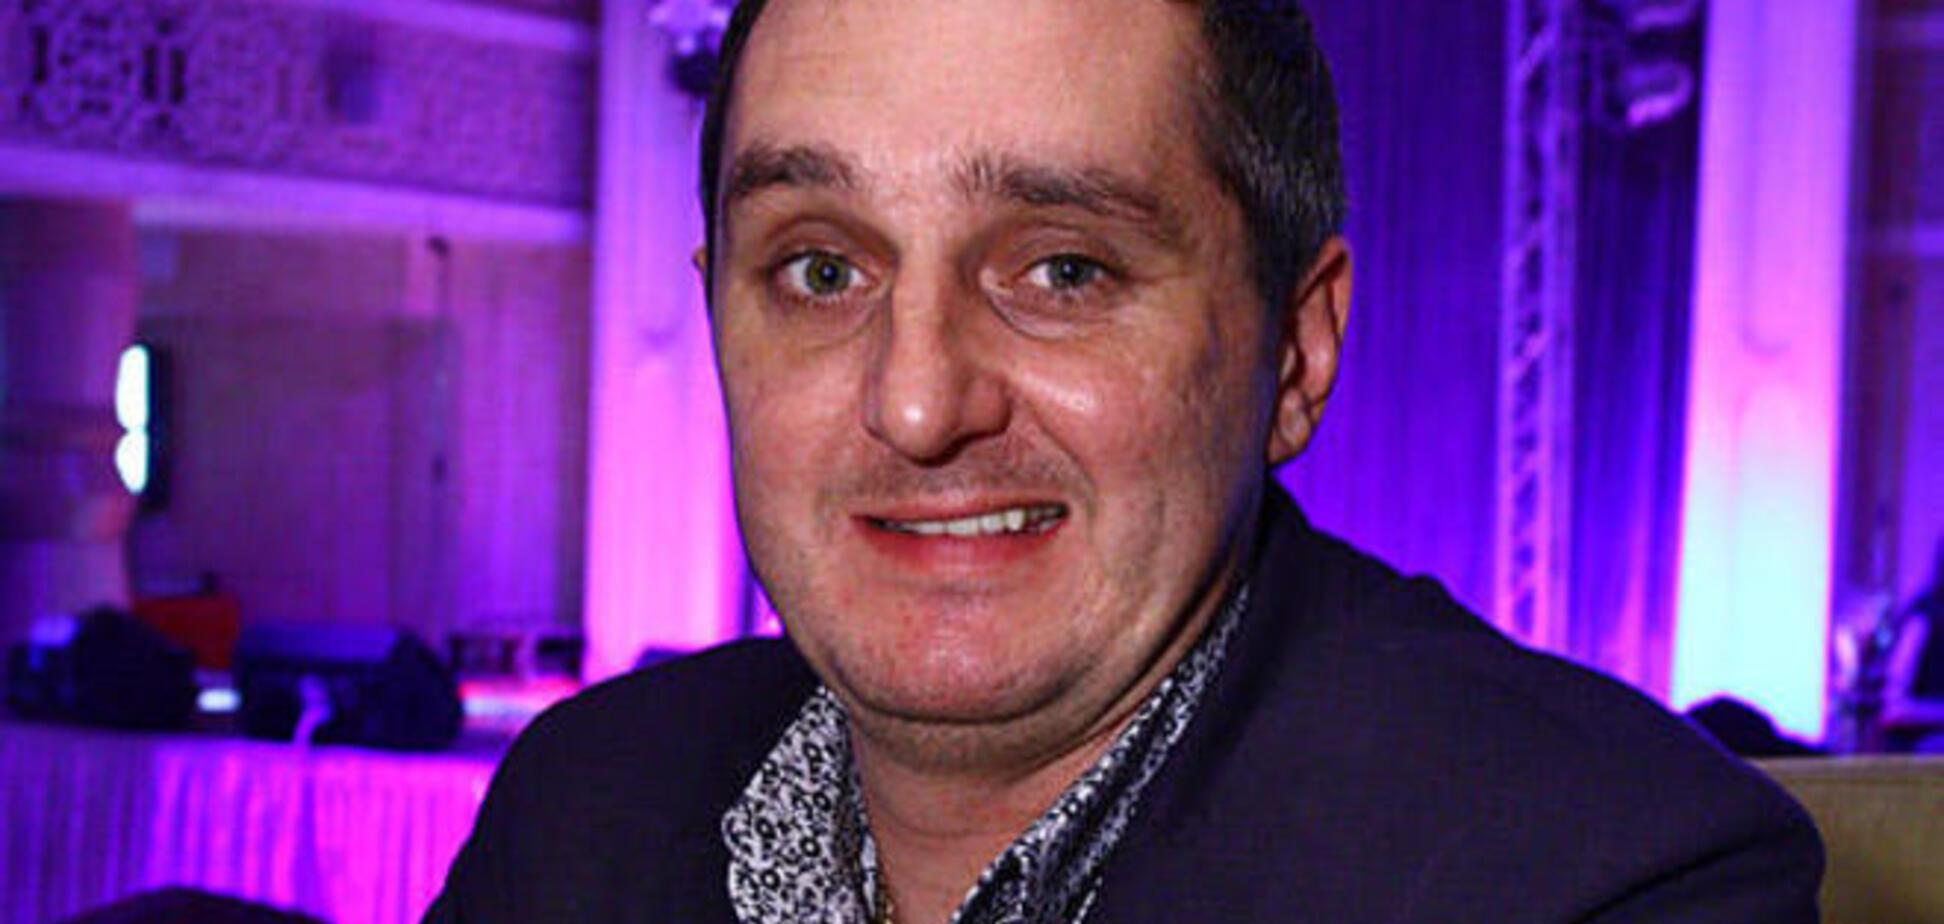 В Киеве обокрали Дядю Жору и разбили его авто